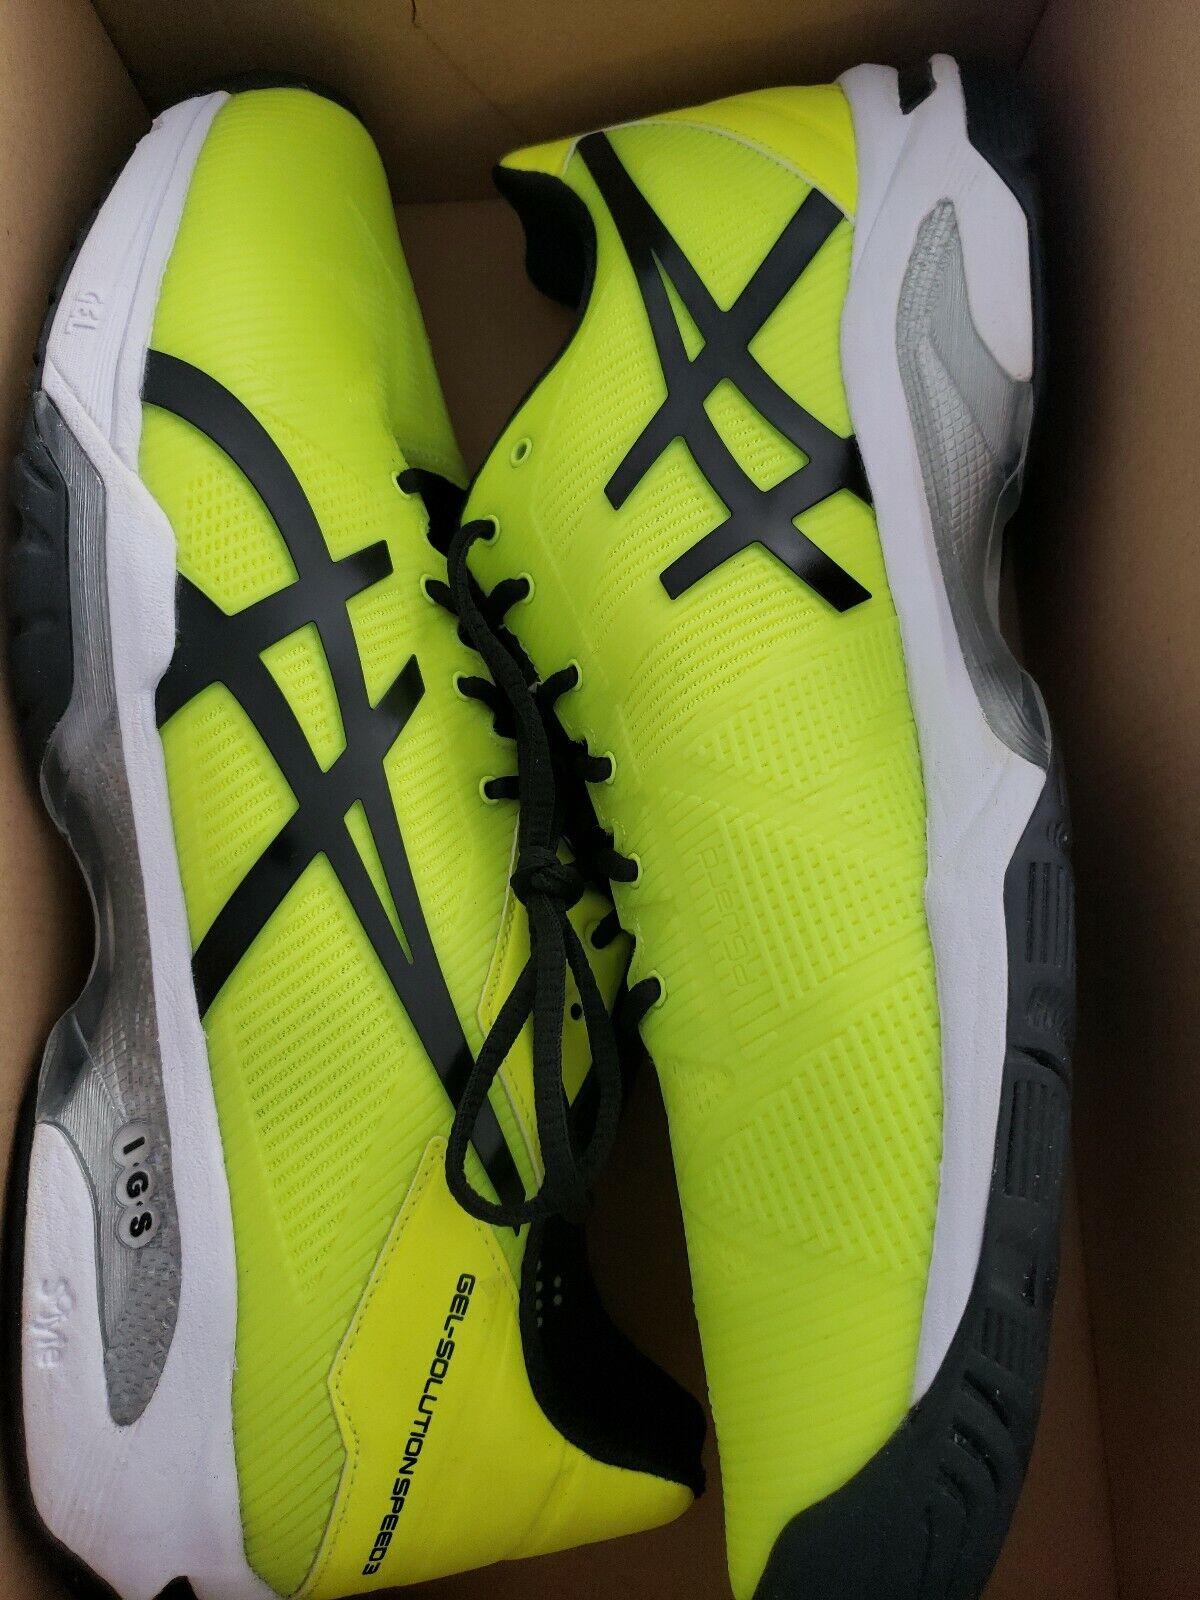 Asics Gel Solución Velocidad 3 Tribunal Tenis Zapato-para Hombres Amarillo Negro WHI